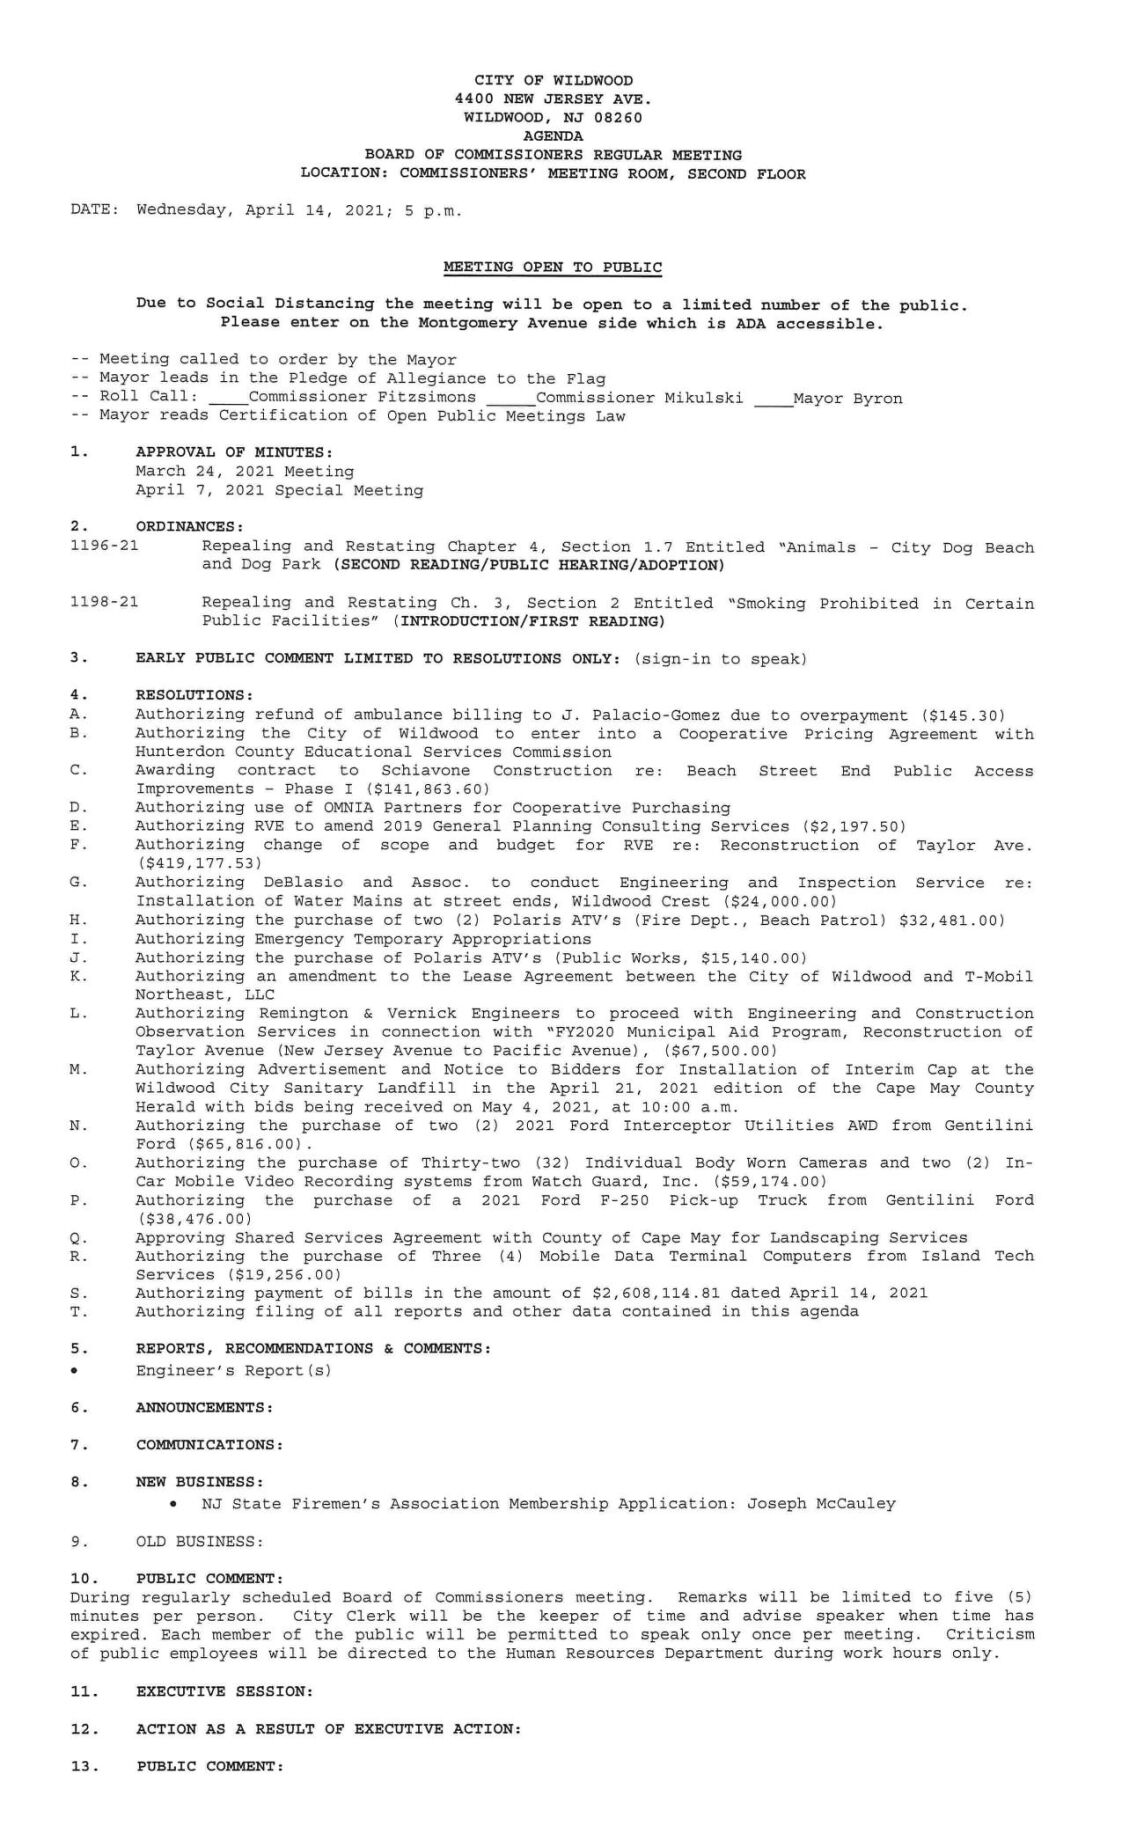 Wildwood City Commissioners Meeting Agenda April 14, 2021